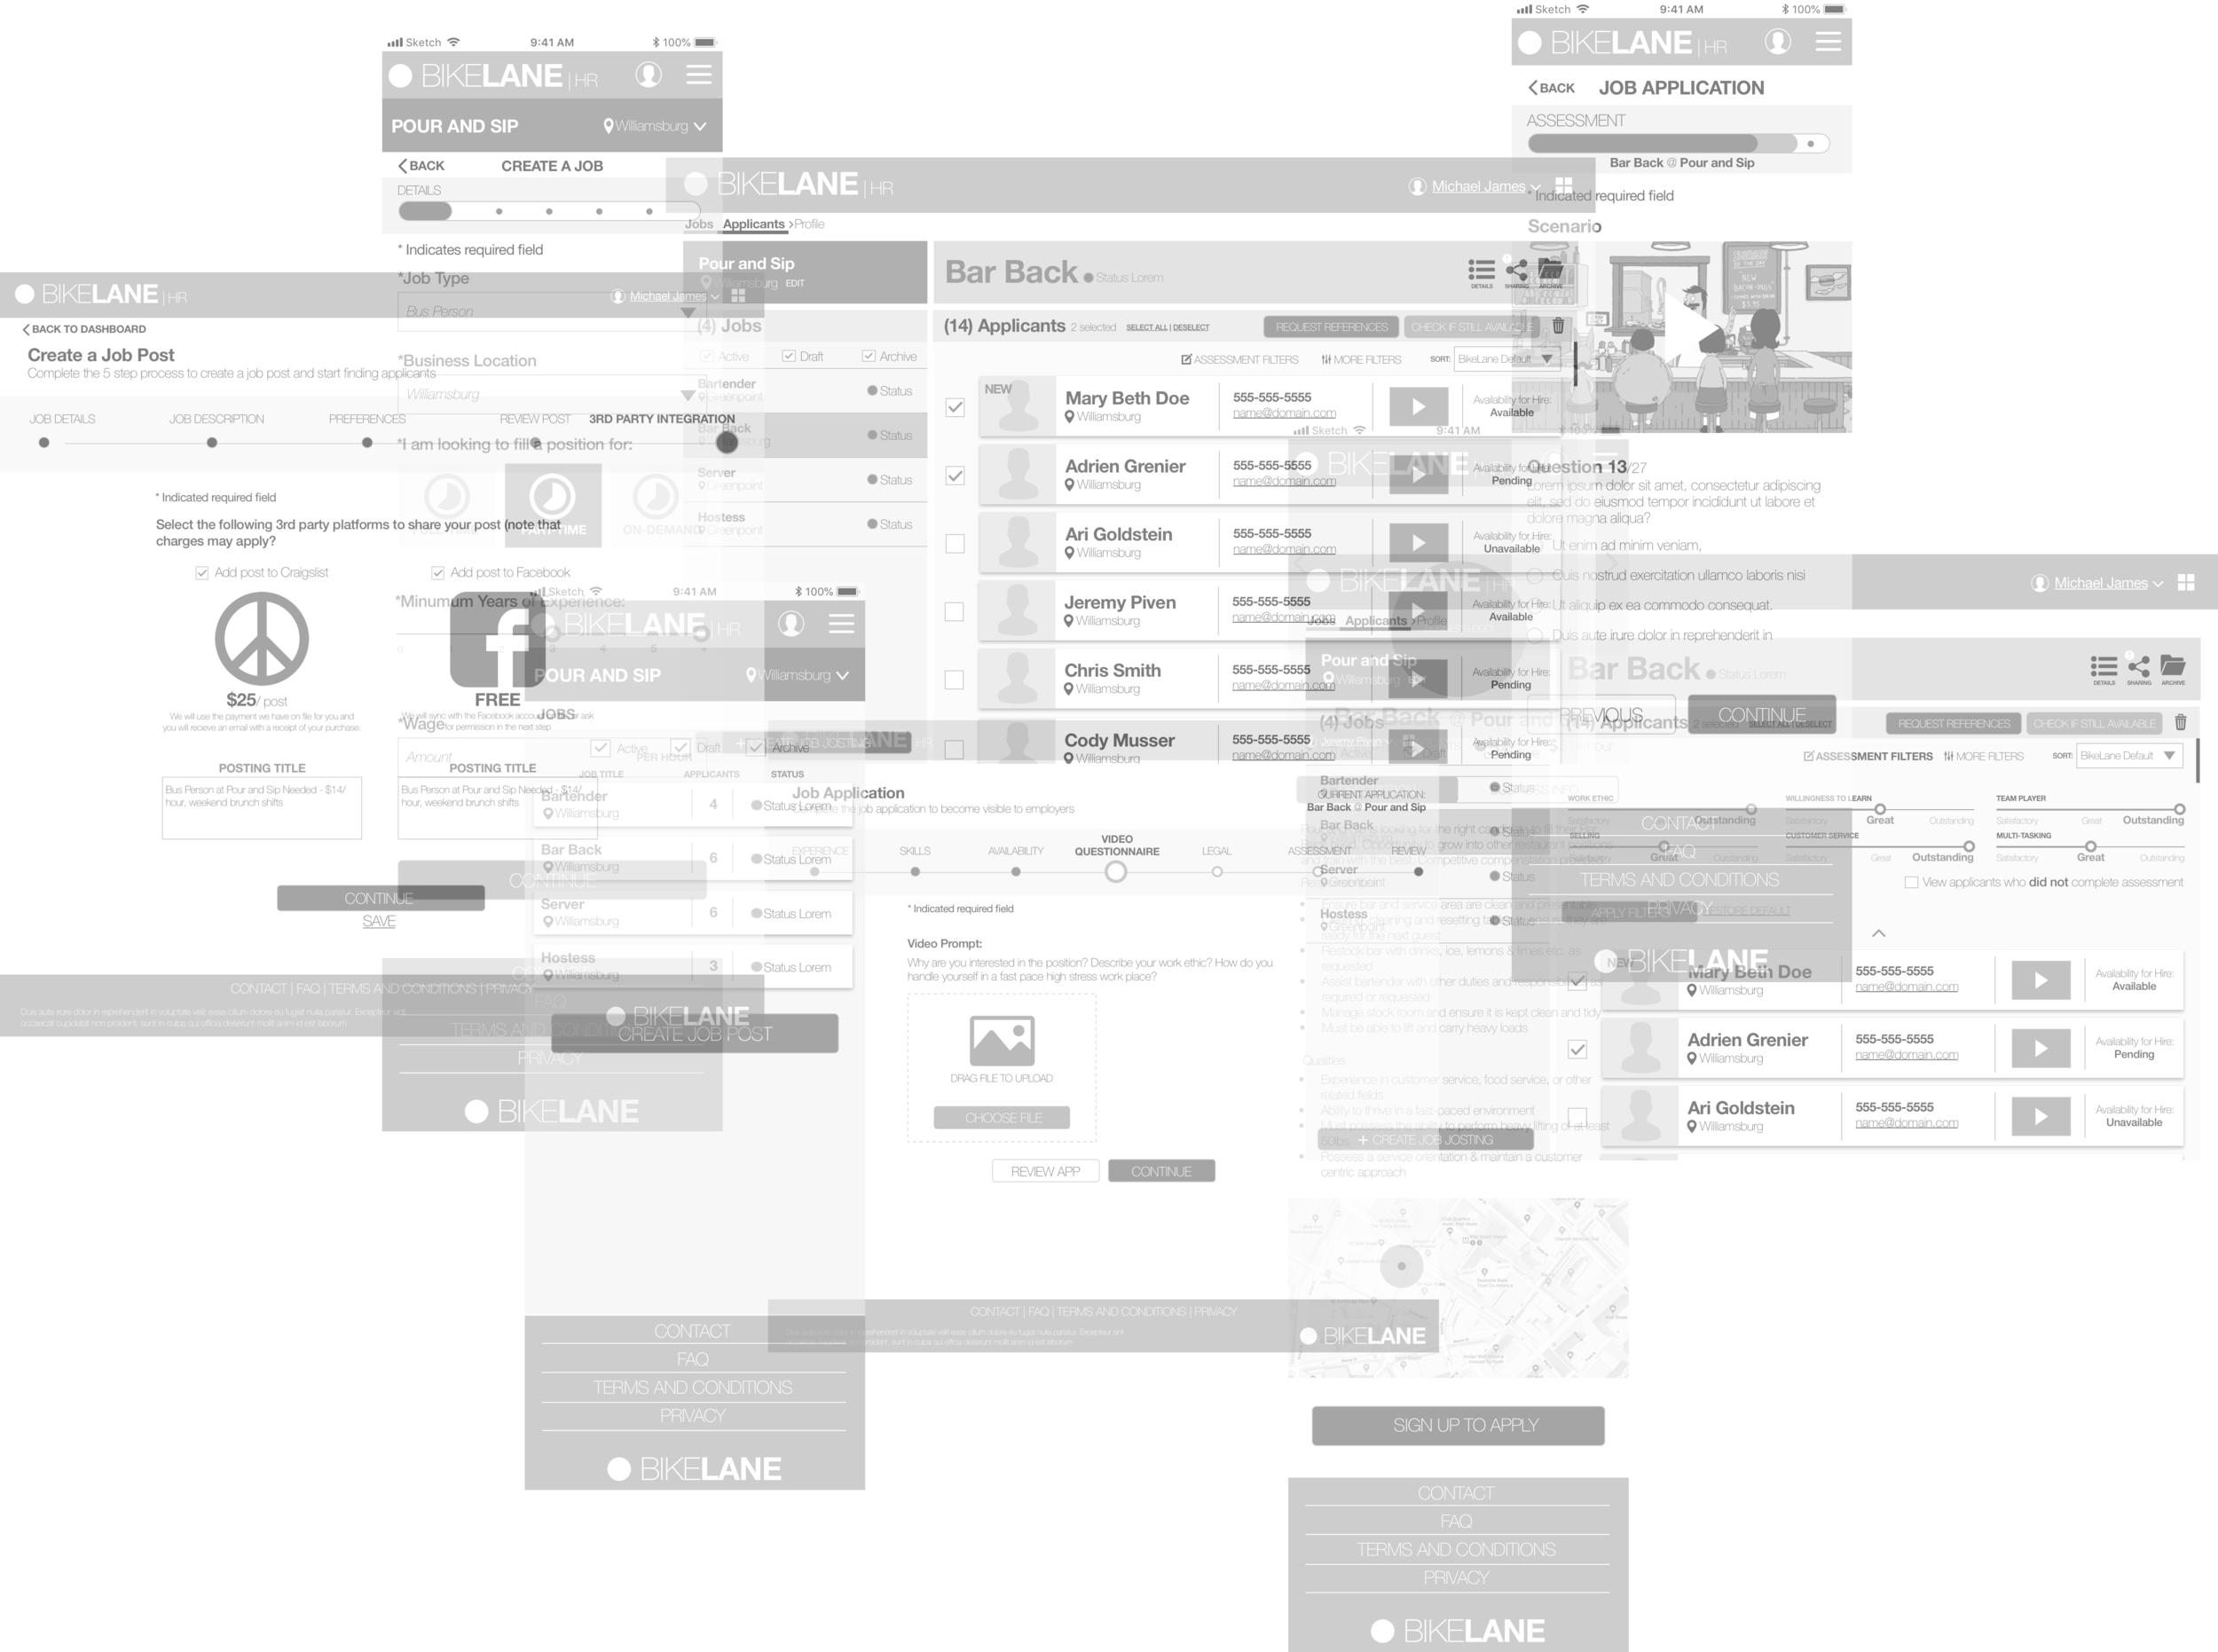 WIREFRAME DESIGN EXPLORATION